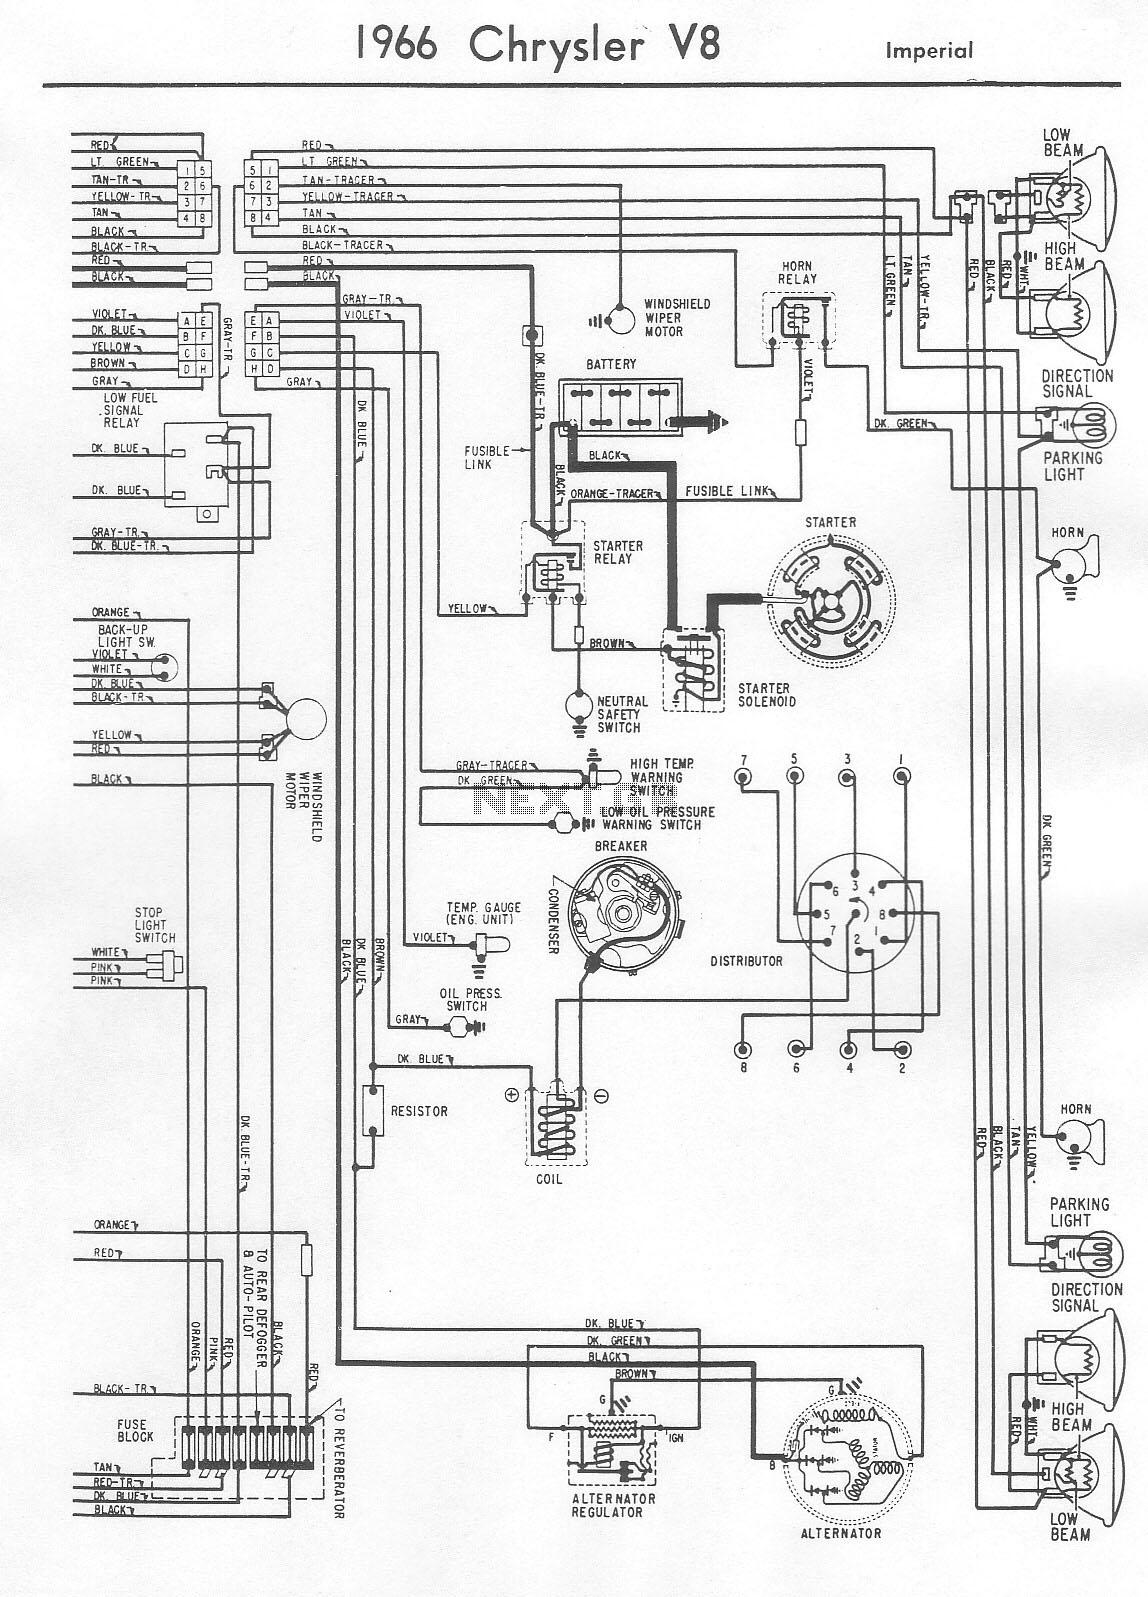 [QNCB_7524]  C855FD 1966 Chrysler 300 Wiring Diagram | Wiring Resources | 1966 Chrysler 300 Power Seat Wiring Diagram |  | Wiring Resources